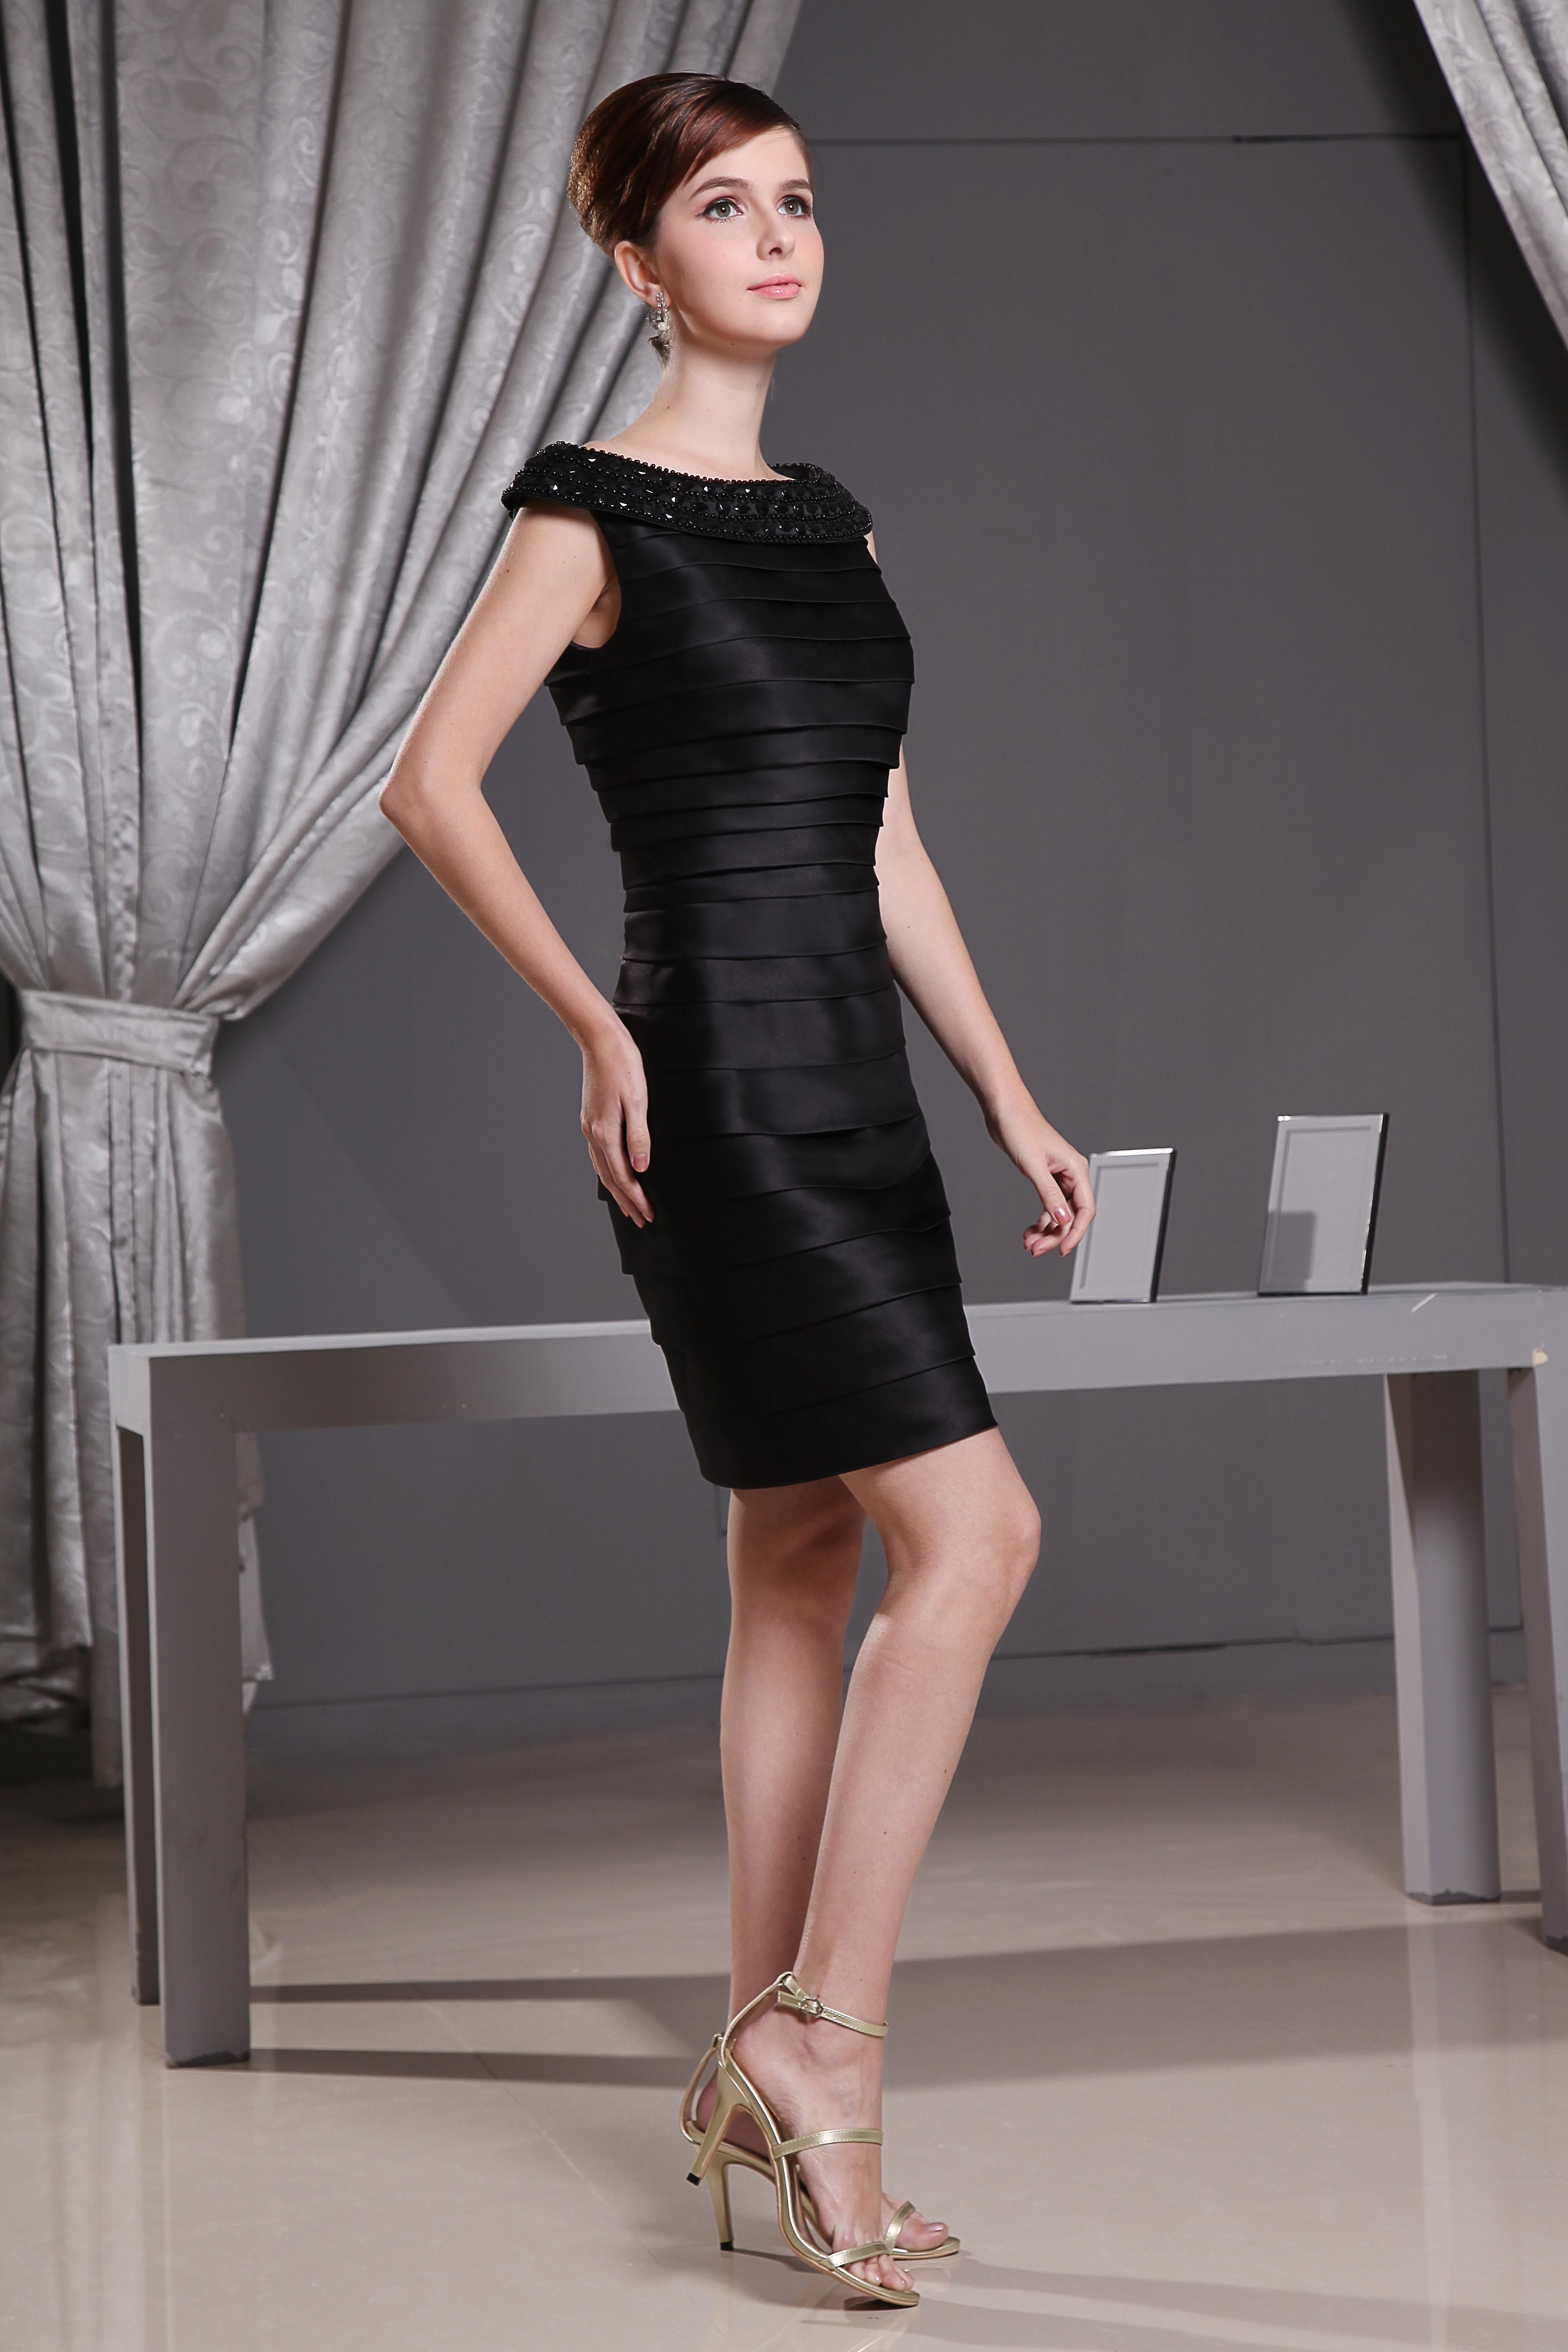 Little Black Dress Short Cocktail Party Dresses With ...